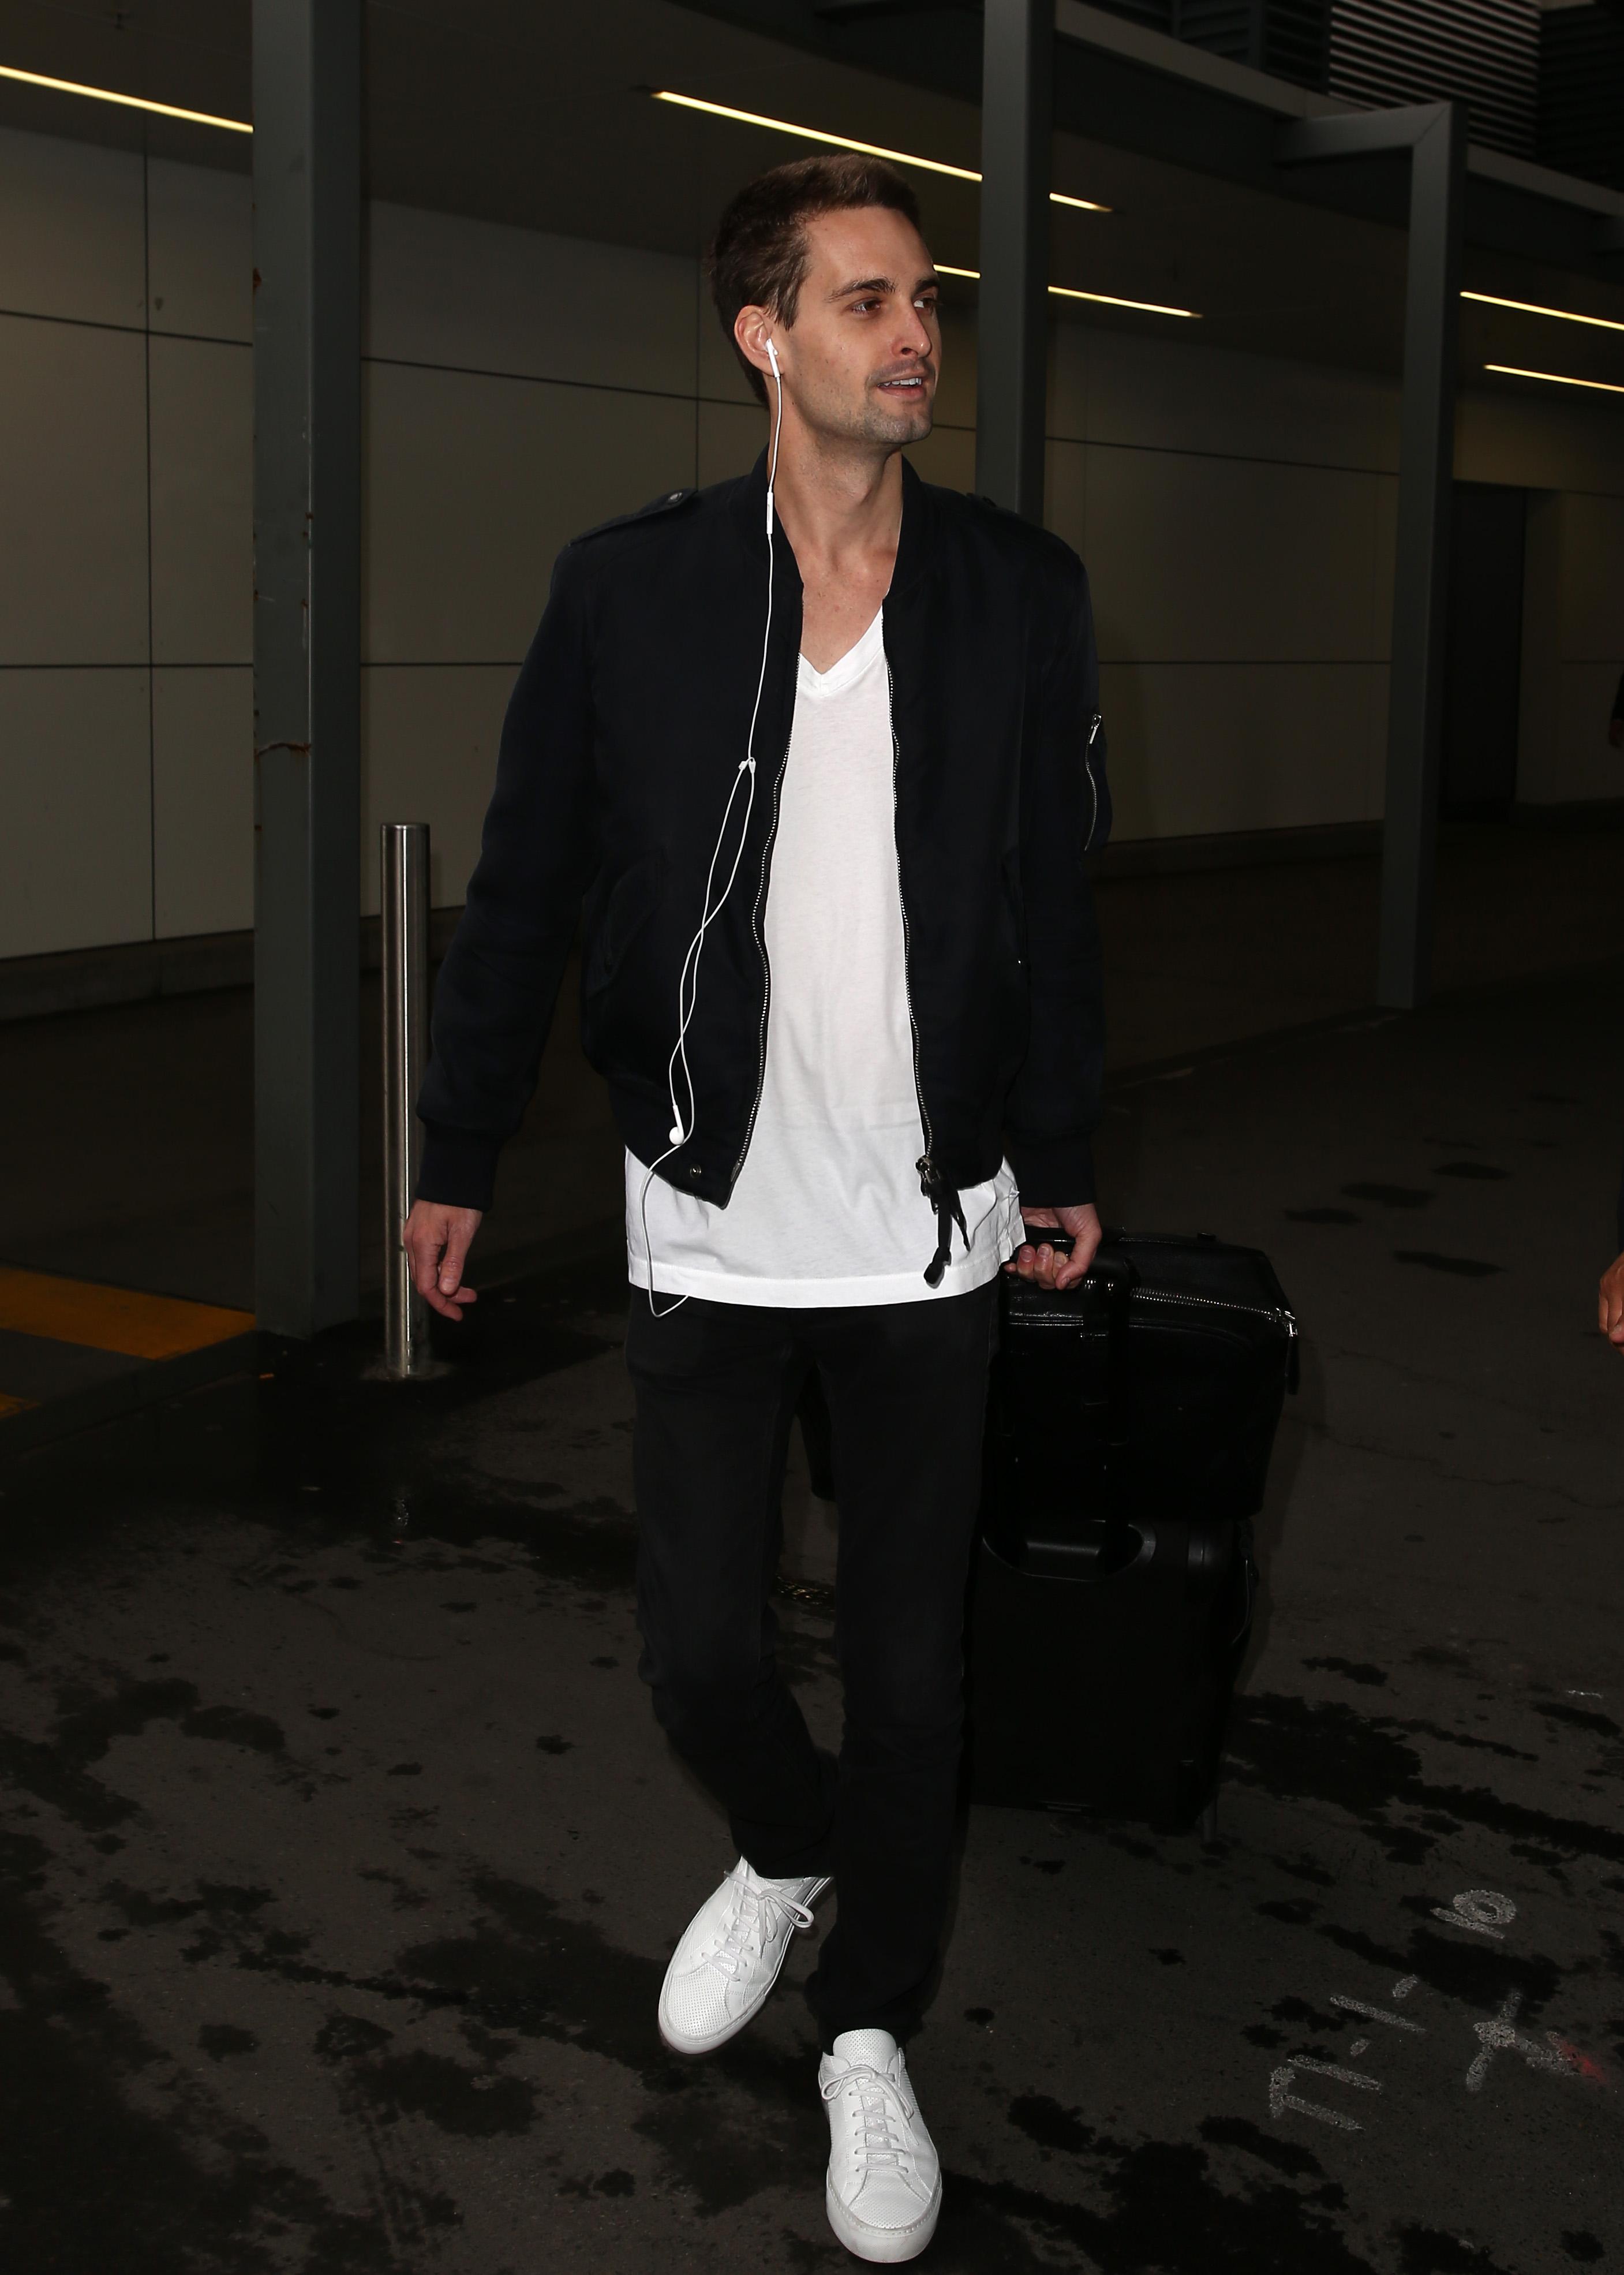 Evan Spiegel jets into Sydney